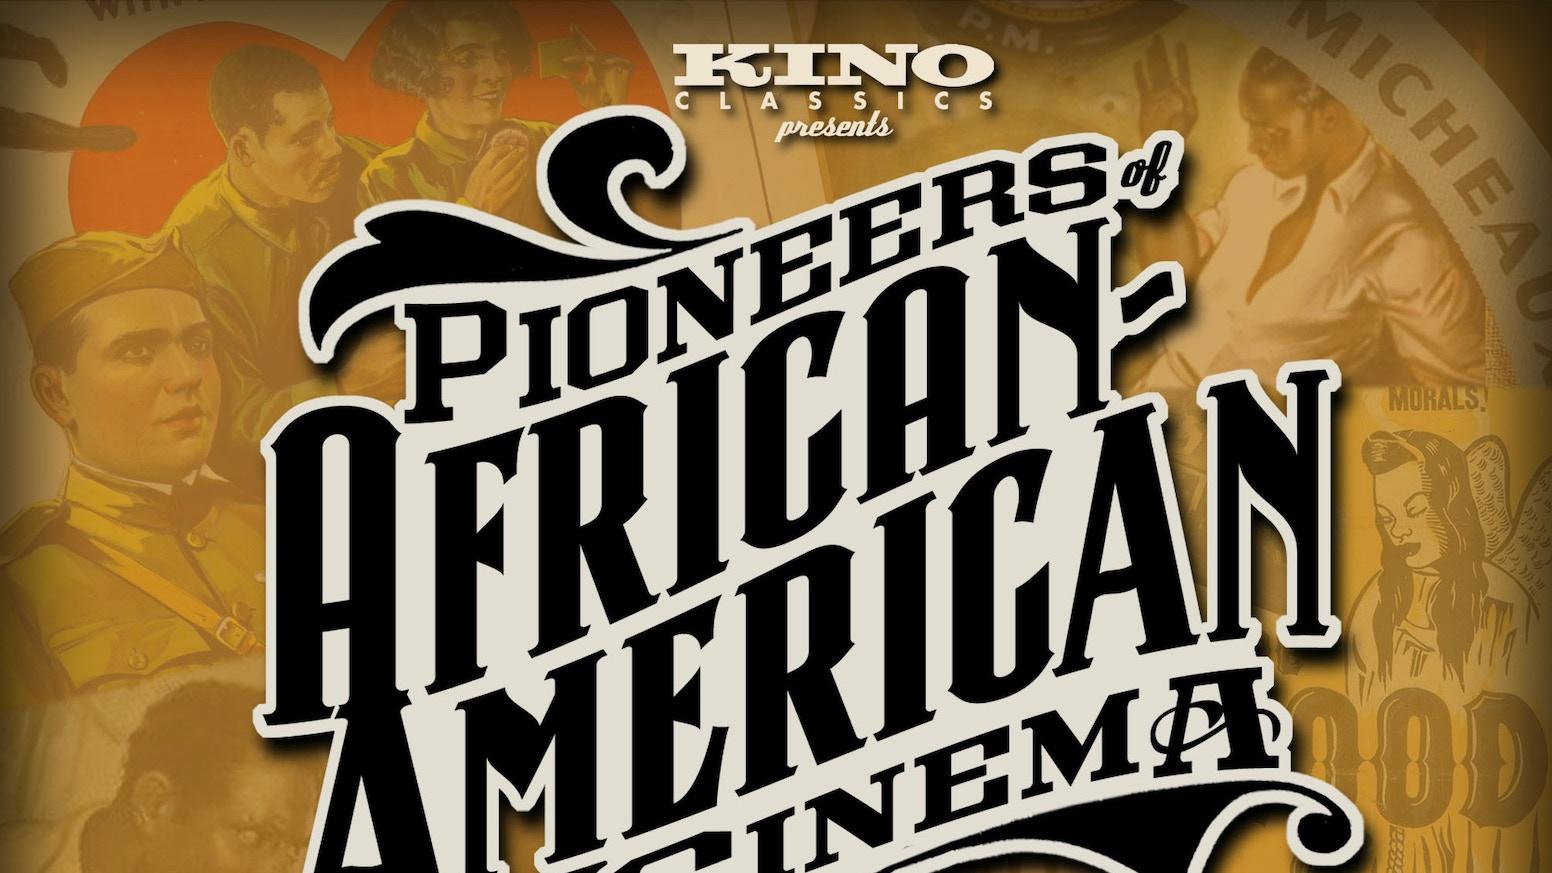 Pioneers of African-American Cinema by Kino Lorber — Kickstarter